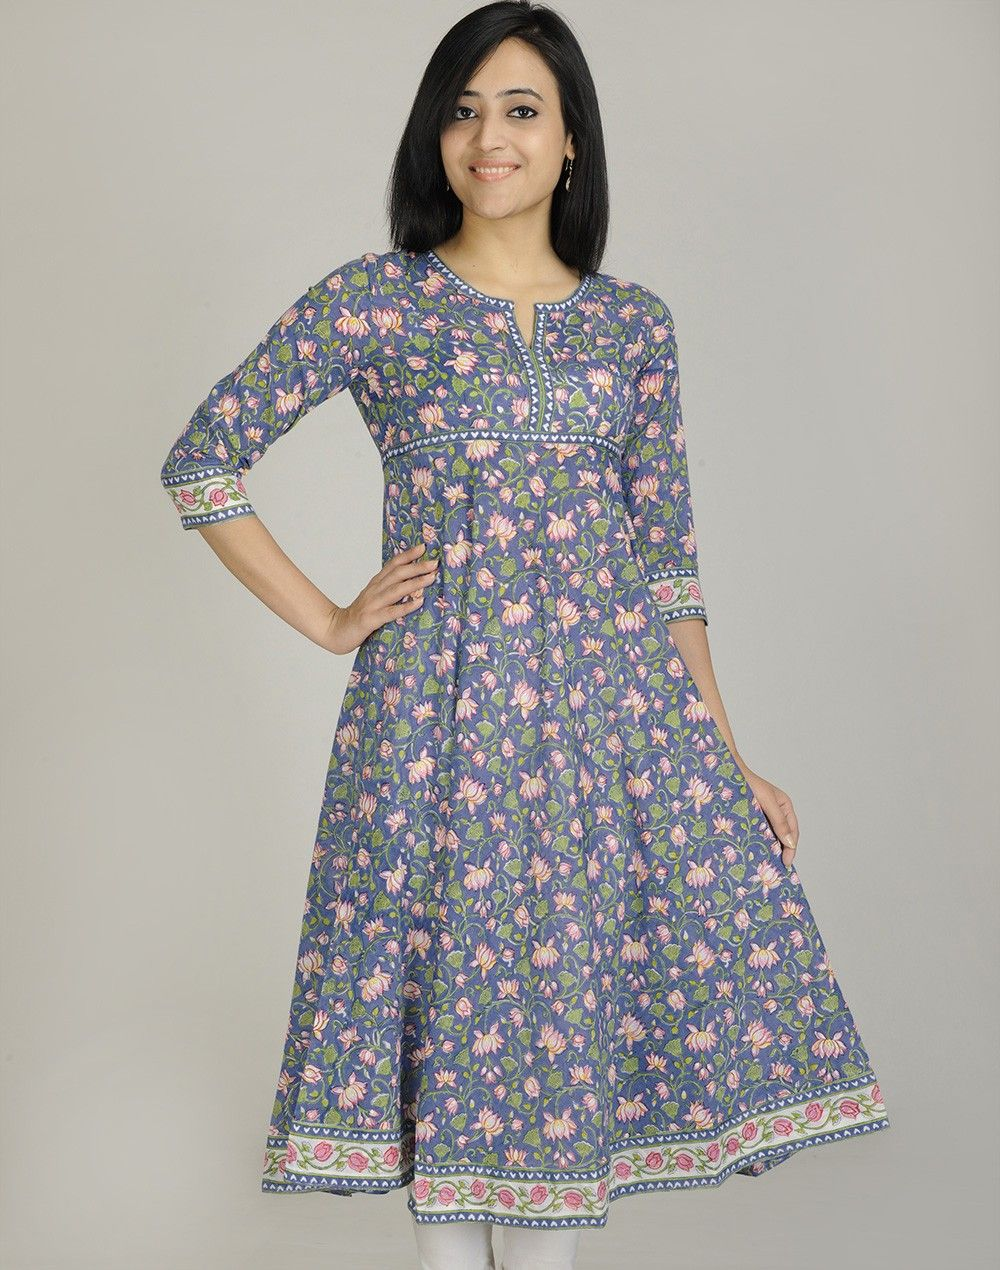 Cotton Printed Empireline Anarkali Long Kurta. $61 on 9/7 ...